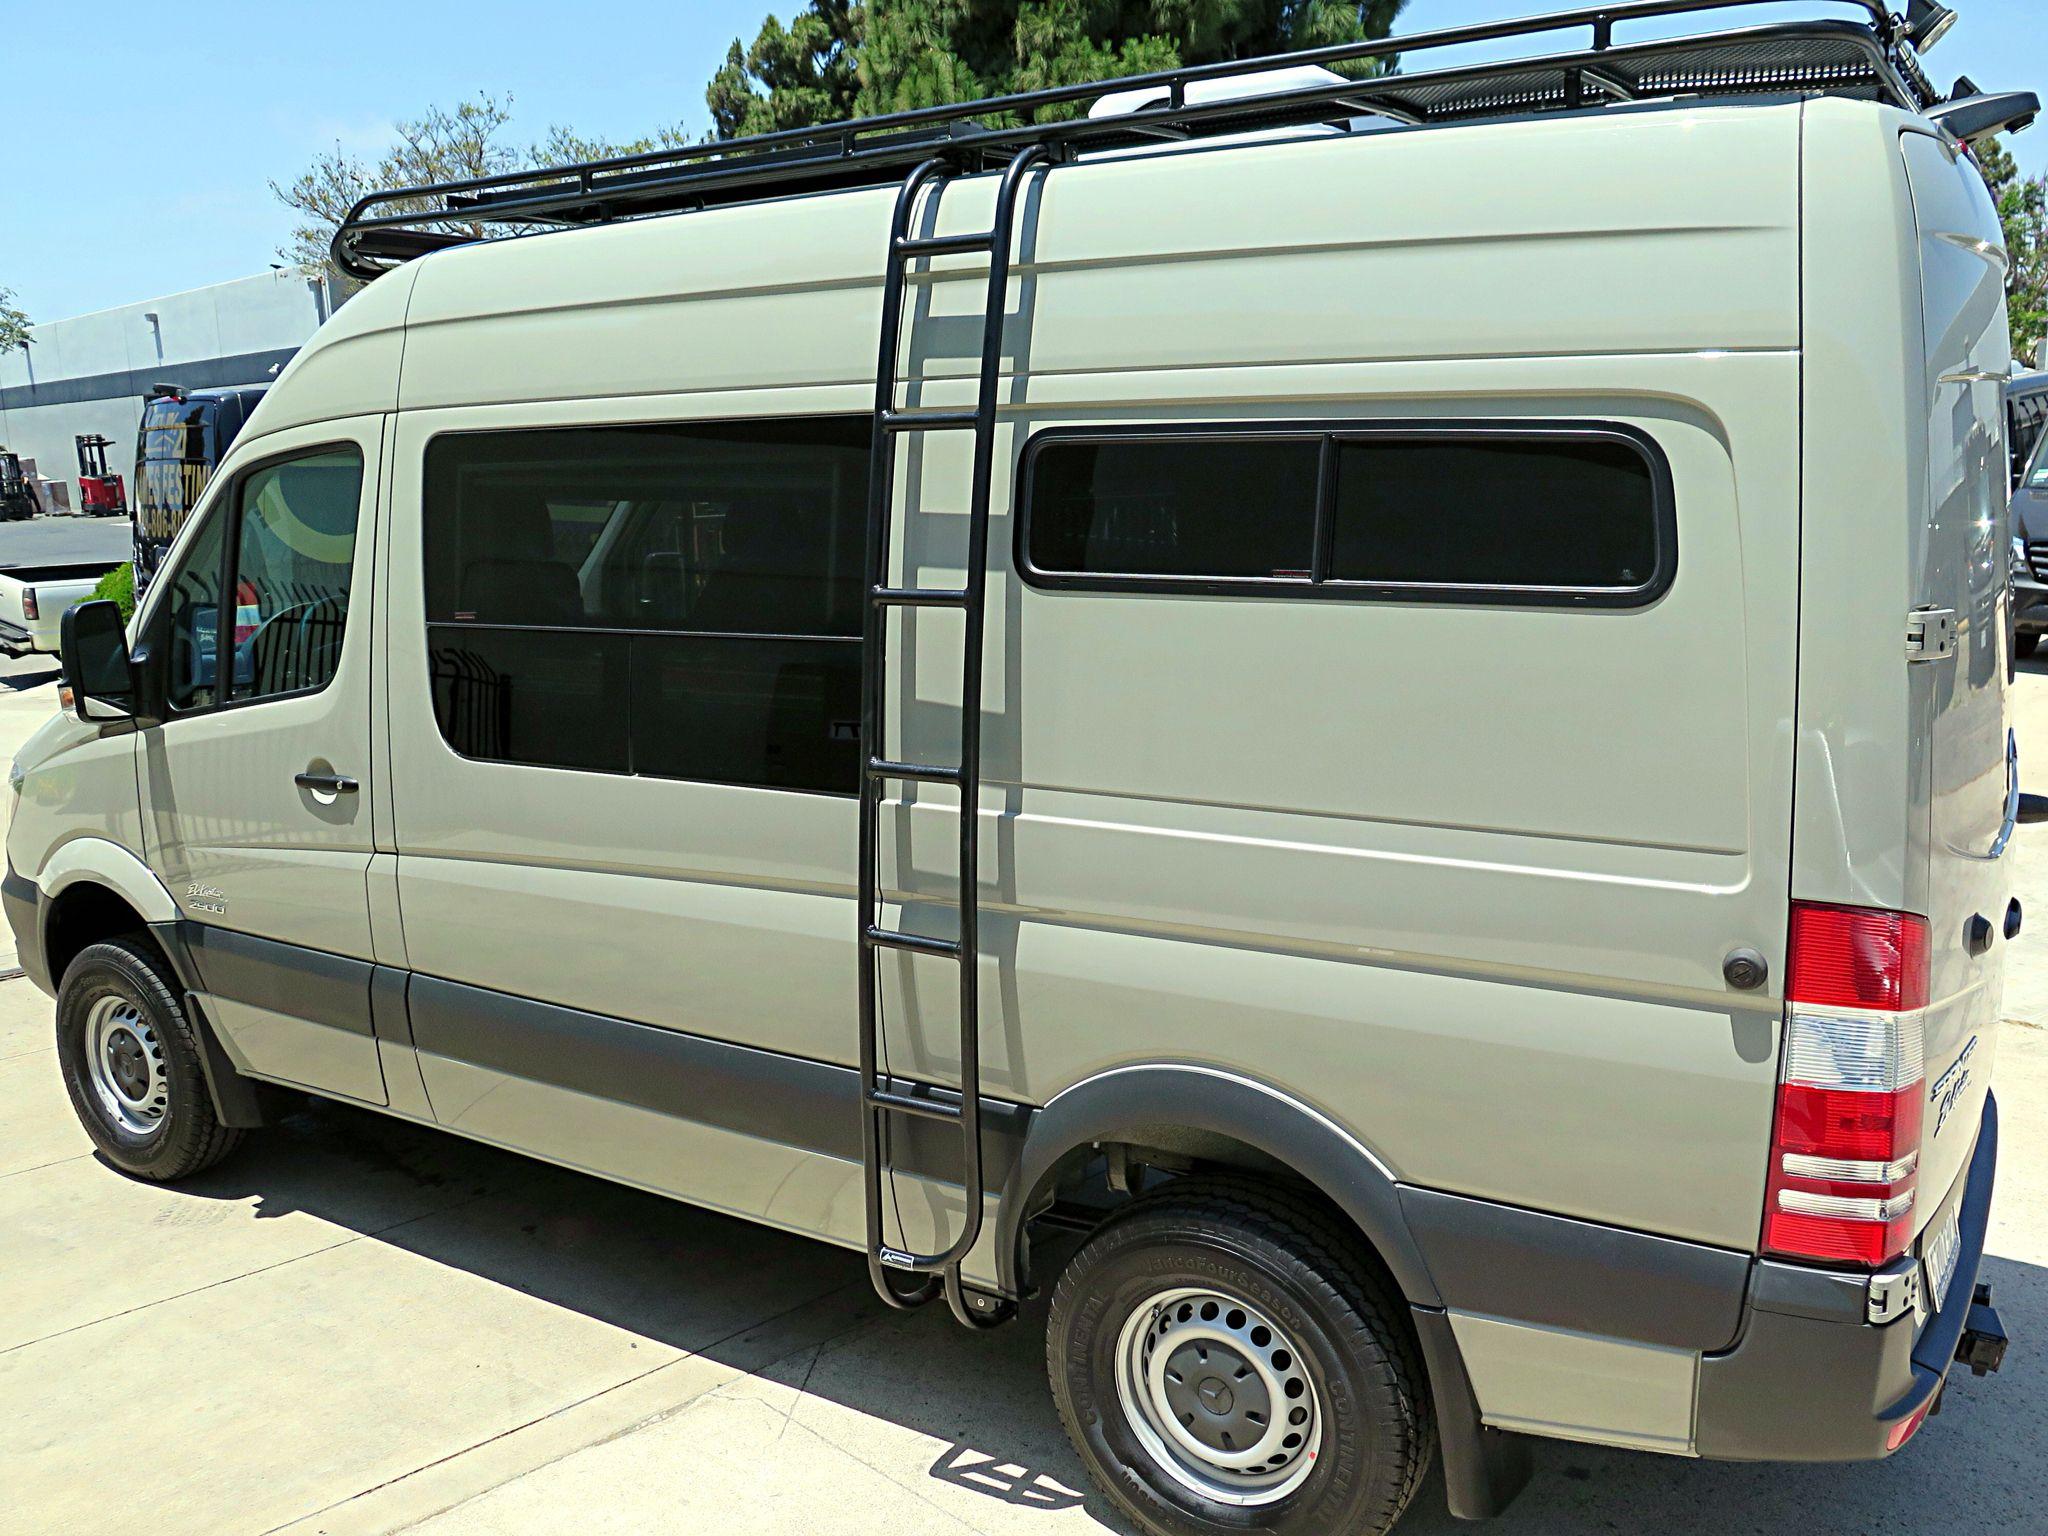 rv gear hauler el kapitan huntington beach california. Black Bedroom Furniture Sets. Home Design Ideas